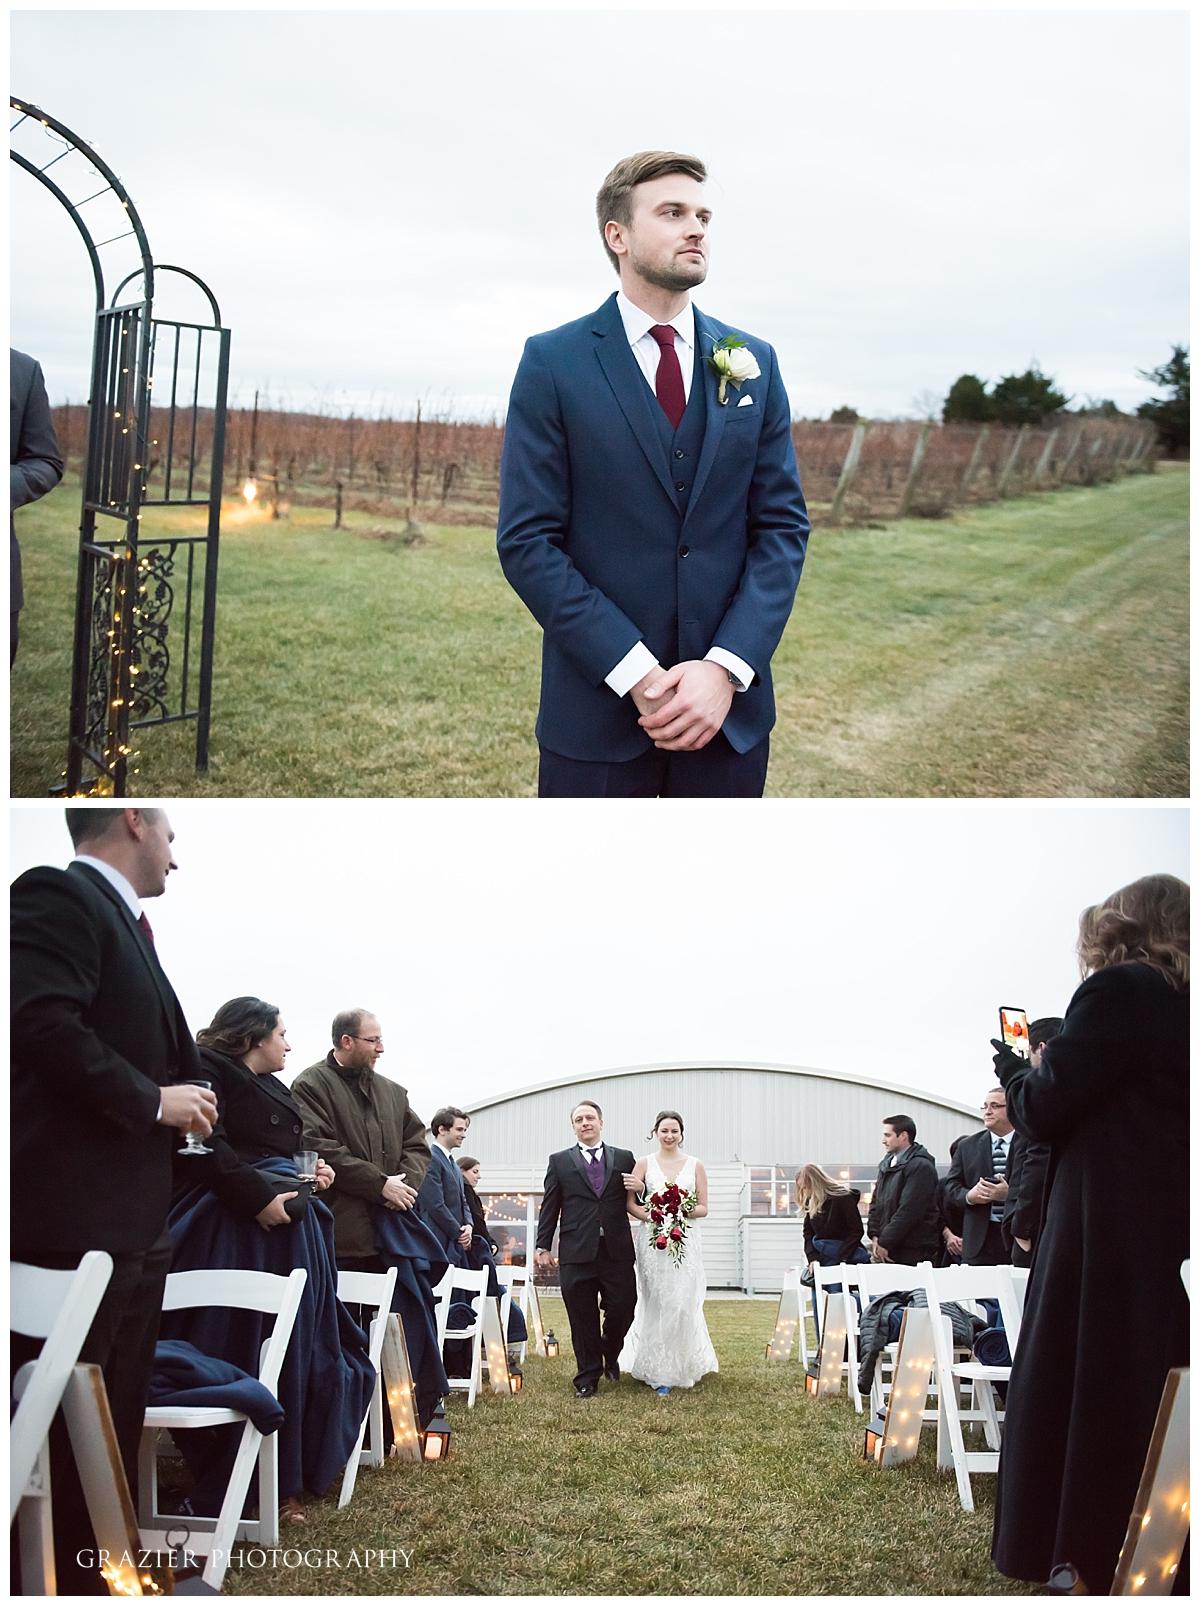 Saltwater Farm Vineyard Wedding Grazier Photography 1222-17-62_WEB.jpg